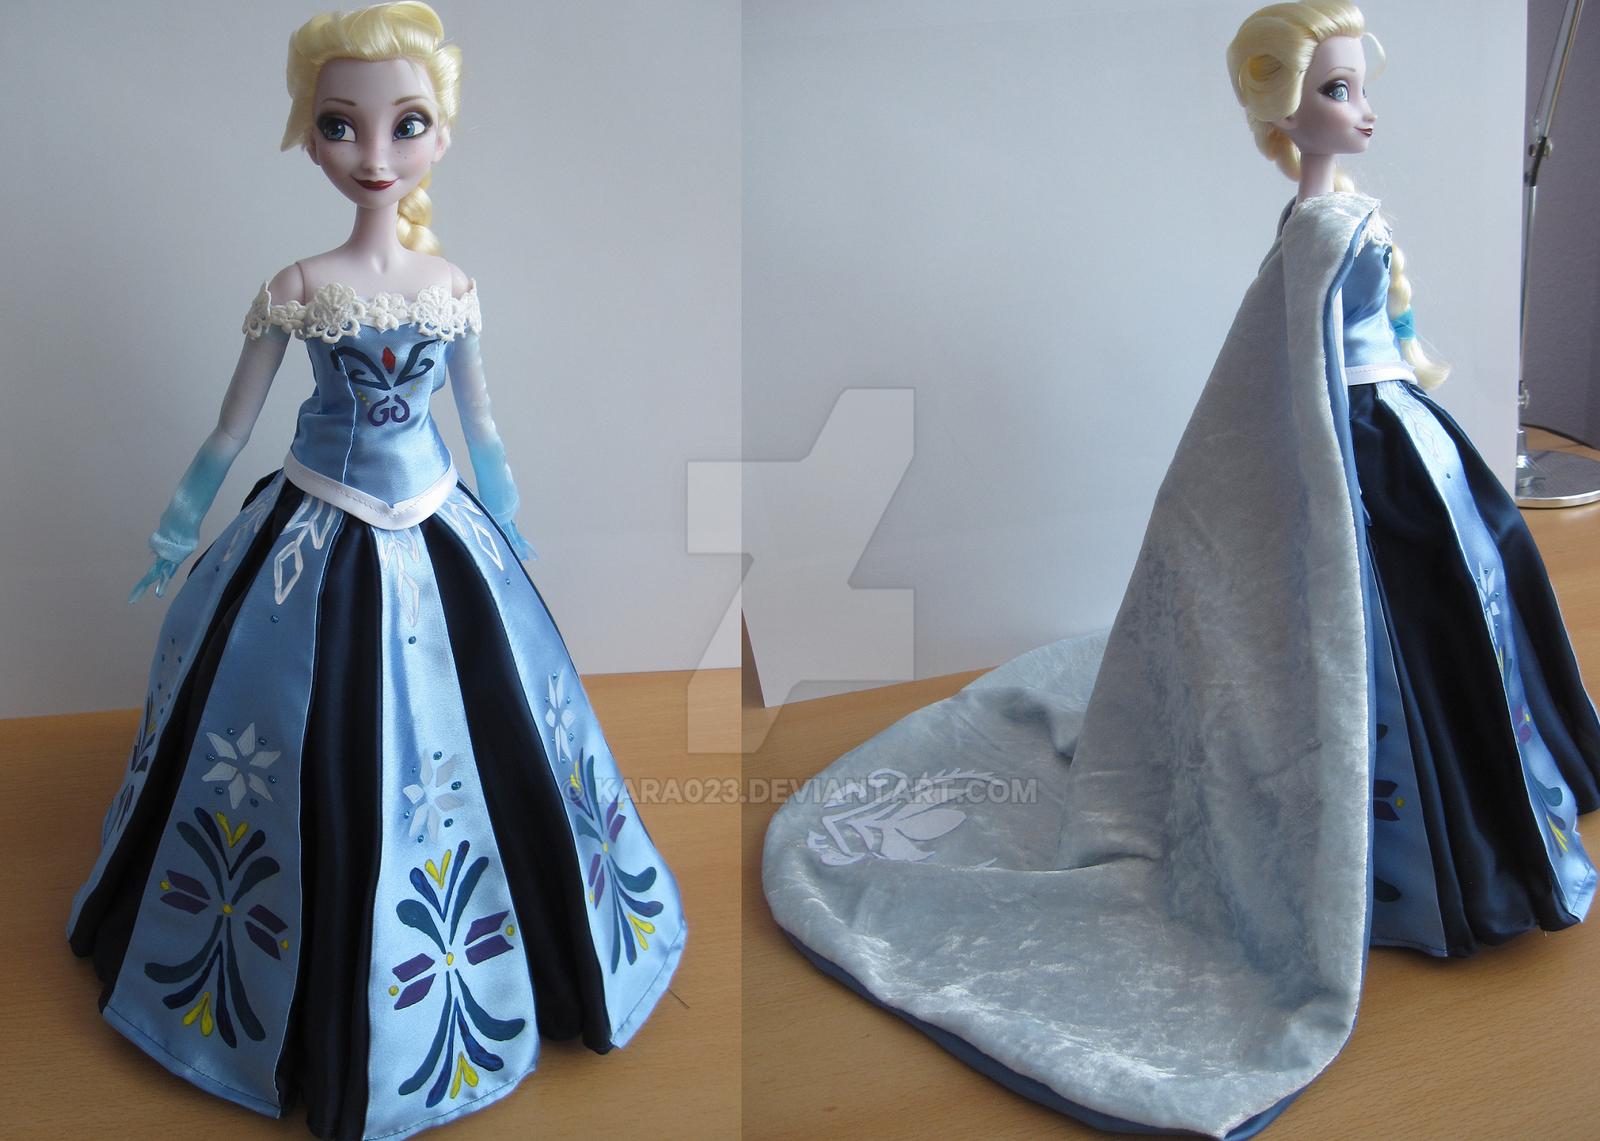 Frozen Queen Elsa coronation dress (Anna sytyle) by kara023